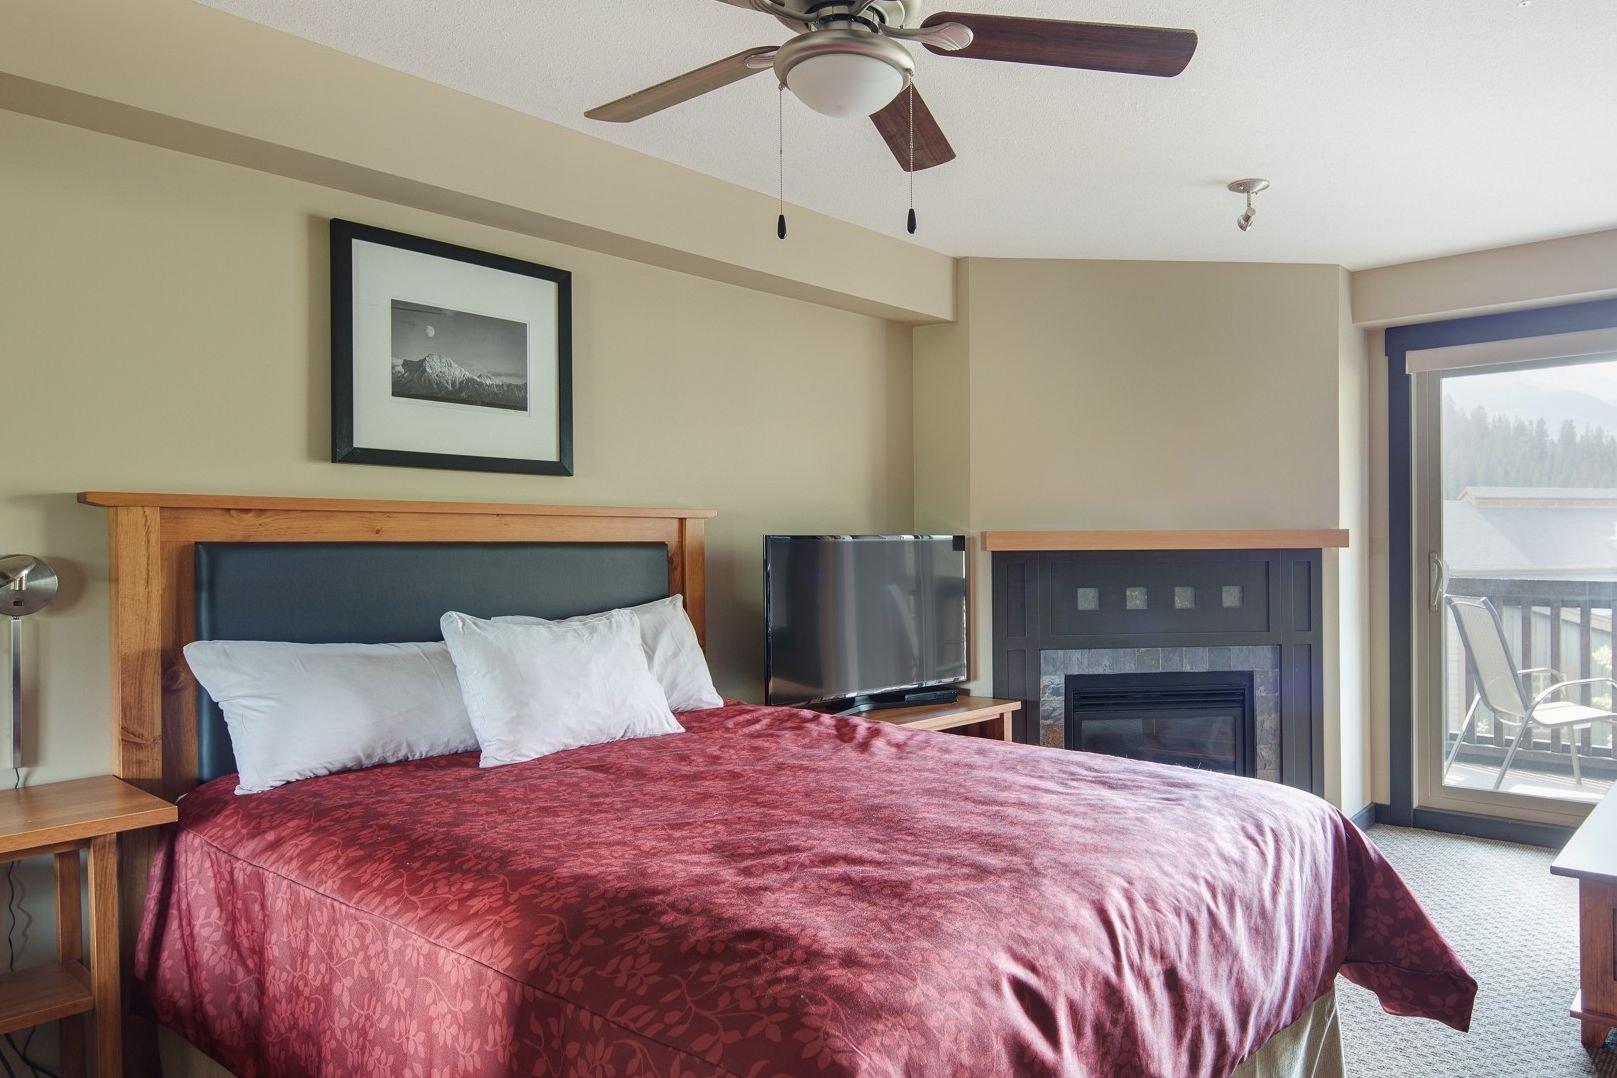 Panorama Mountain Village - 1000 peaks lodge bedroom 2.jpg